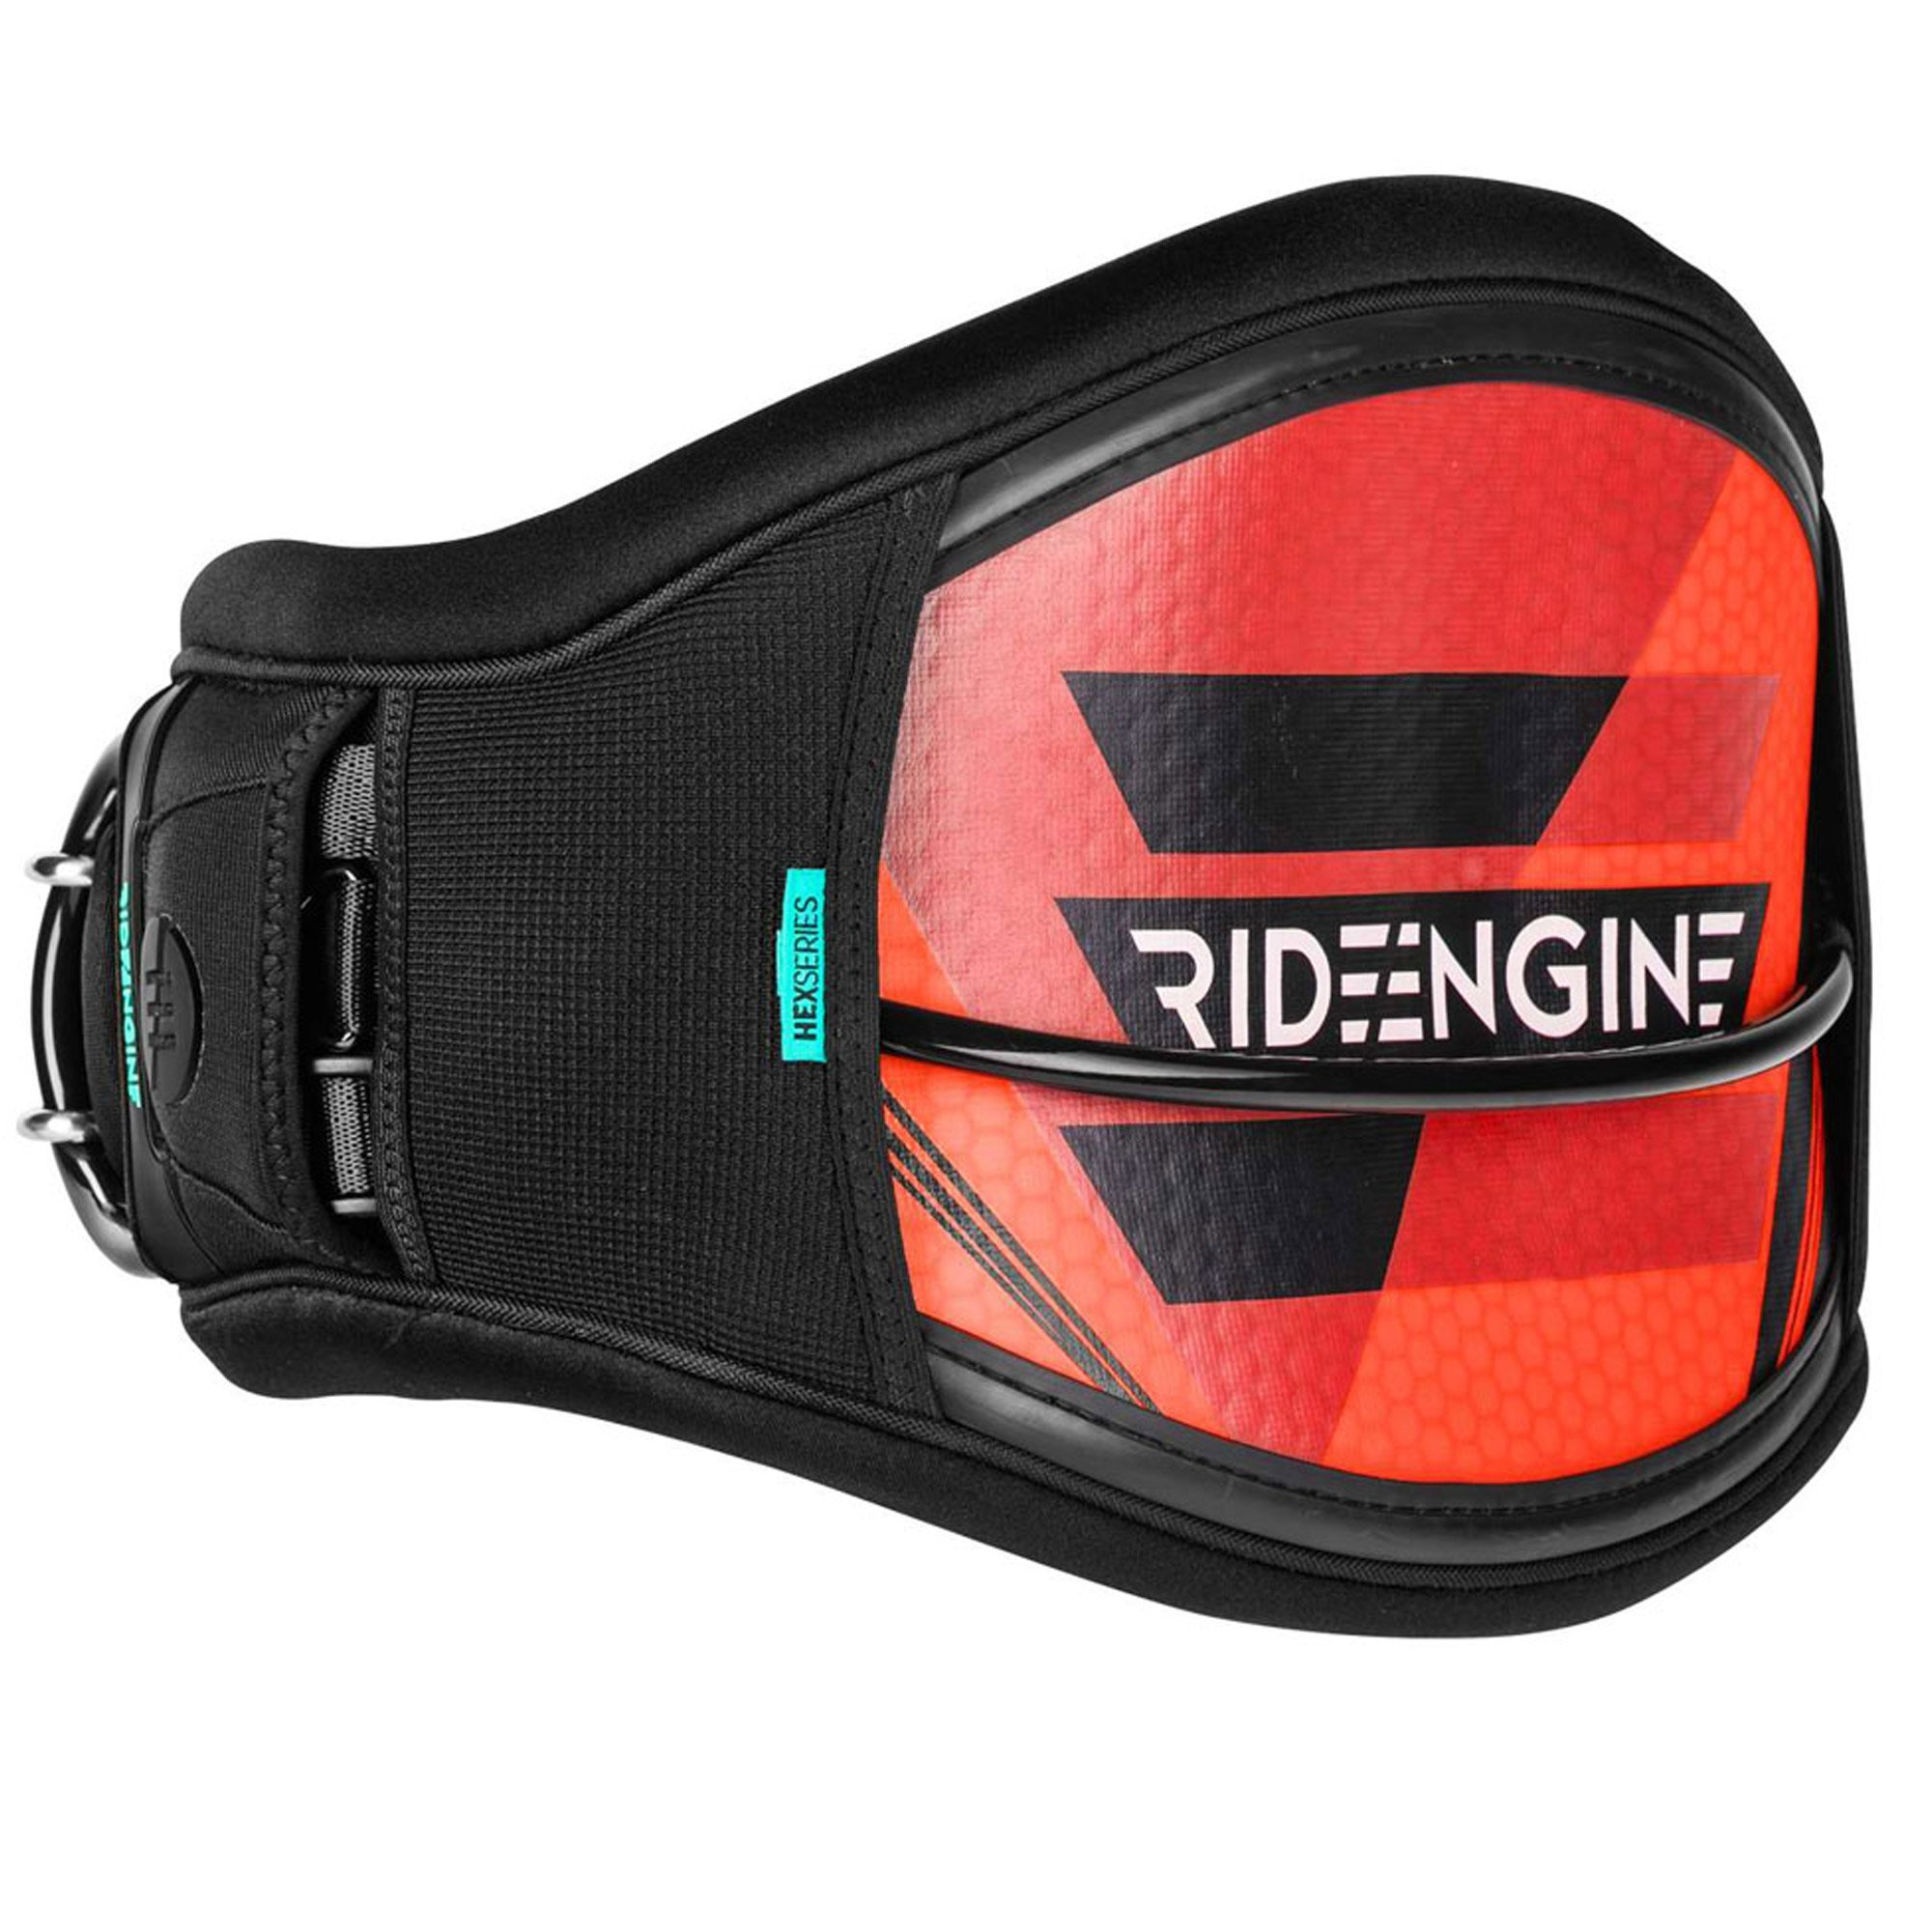 Ride Engine Kiteboarding HarnessHex-Core Orange Harness M by Ride Engine (Image #1)